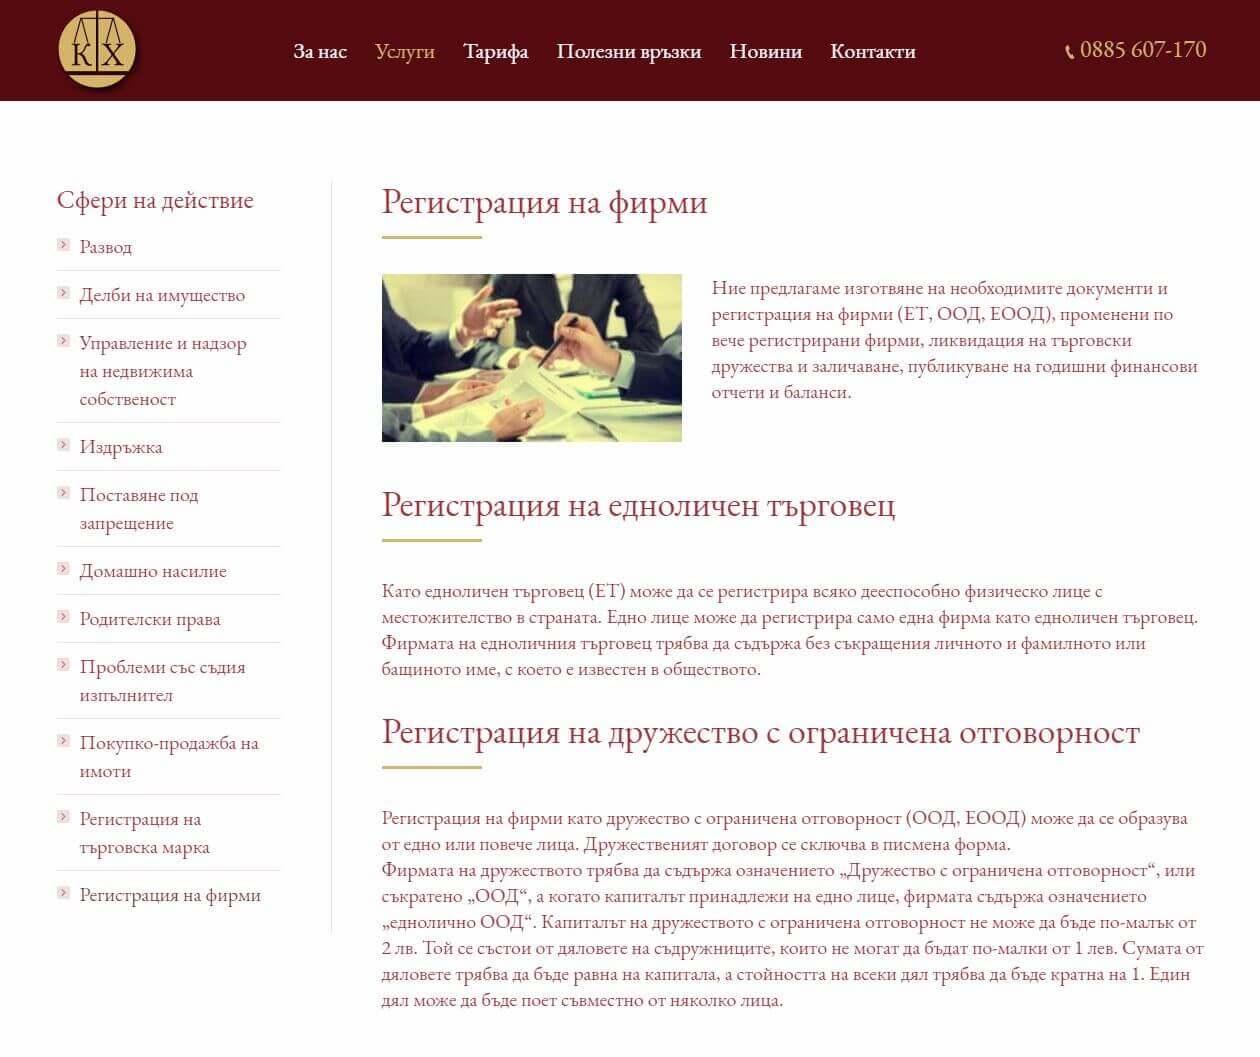 Адвокатско дружество Христова, Аргирова и СИЕ с нов, интерактивен уеб сайт